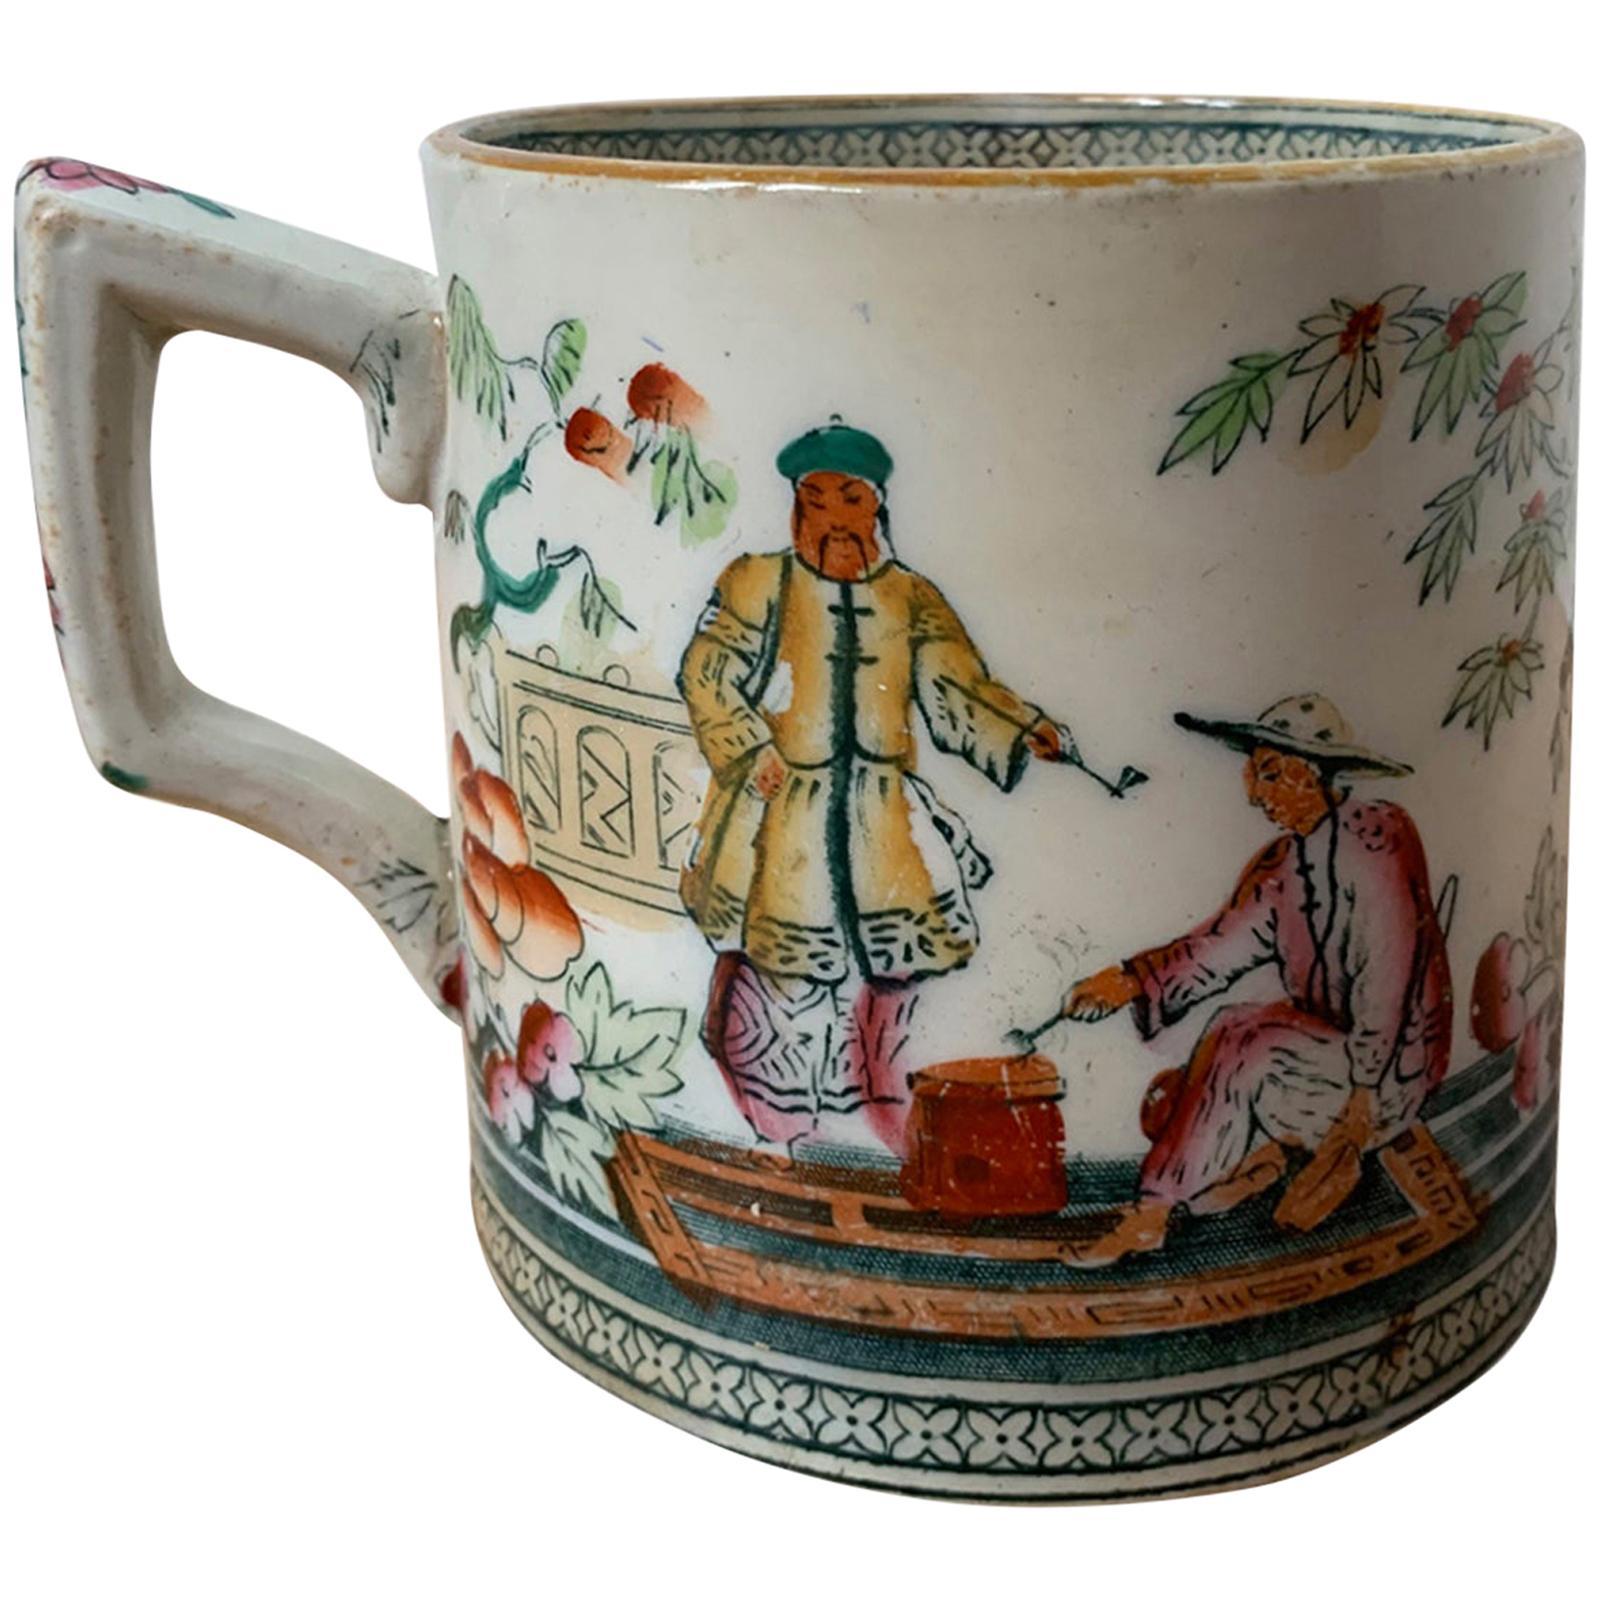 19th-20th Century English Porcelain Mug, Unmarked